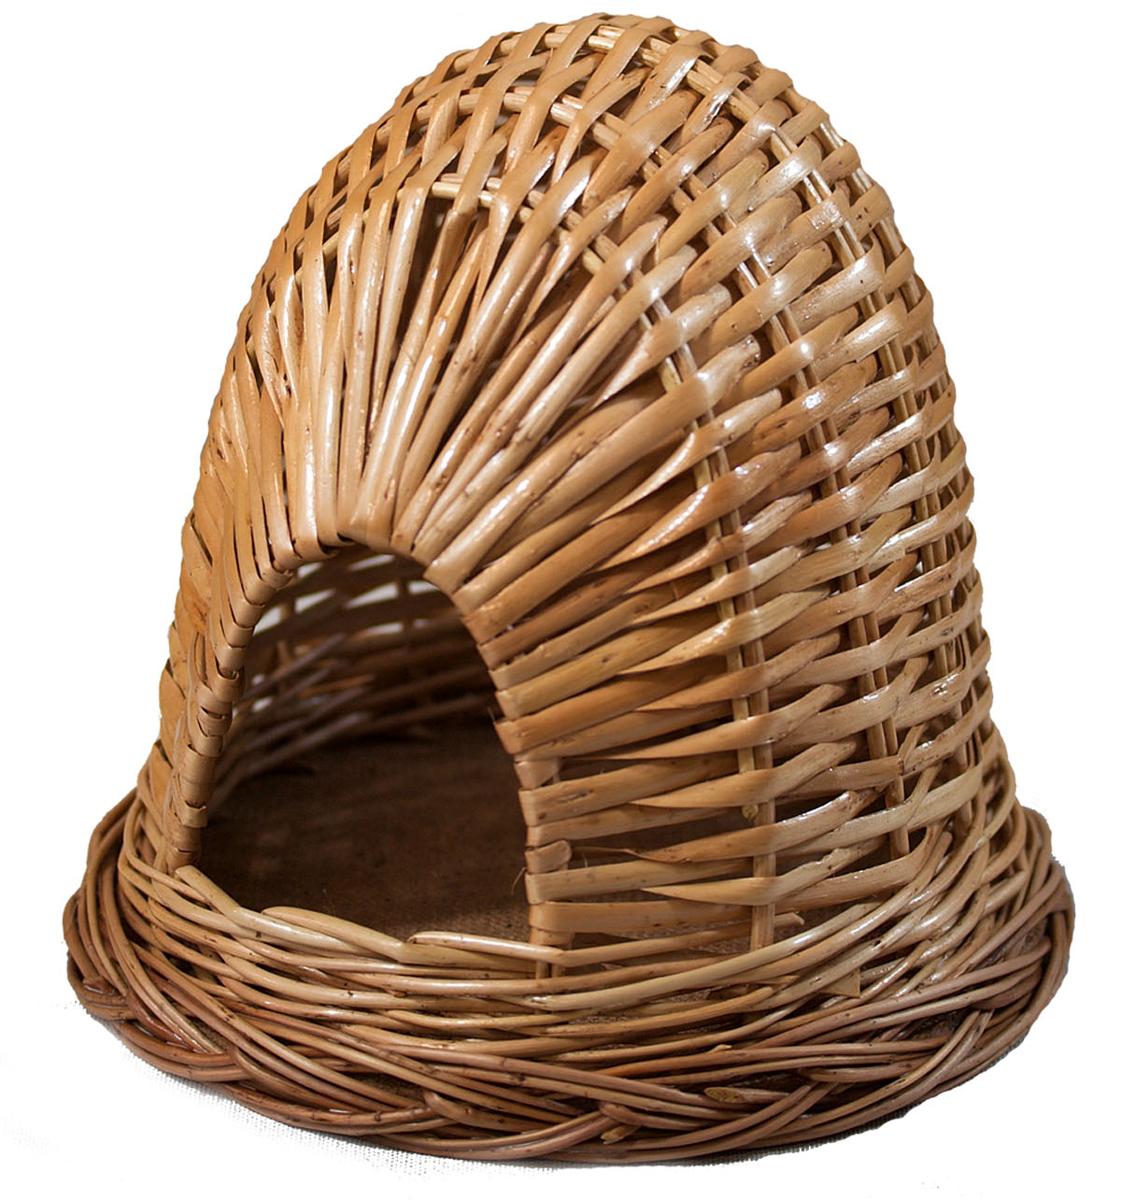 Домик для хомячка из лозы №2 17,5х17,5х17 плетеные корзины из лозы купить краснодар